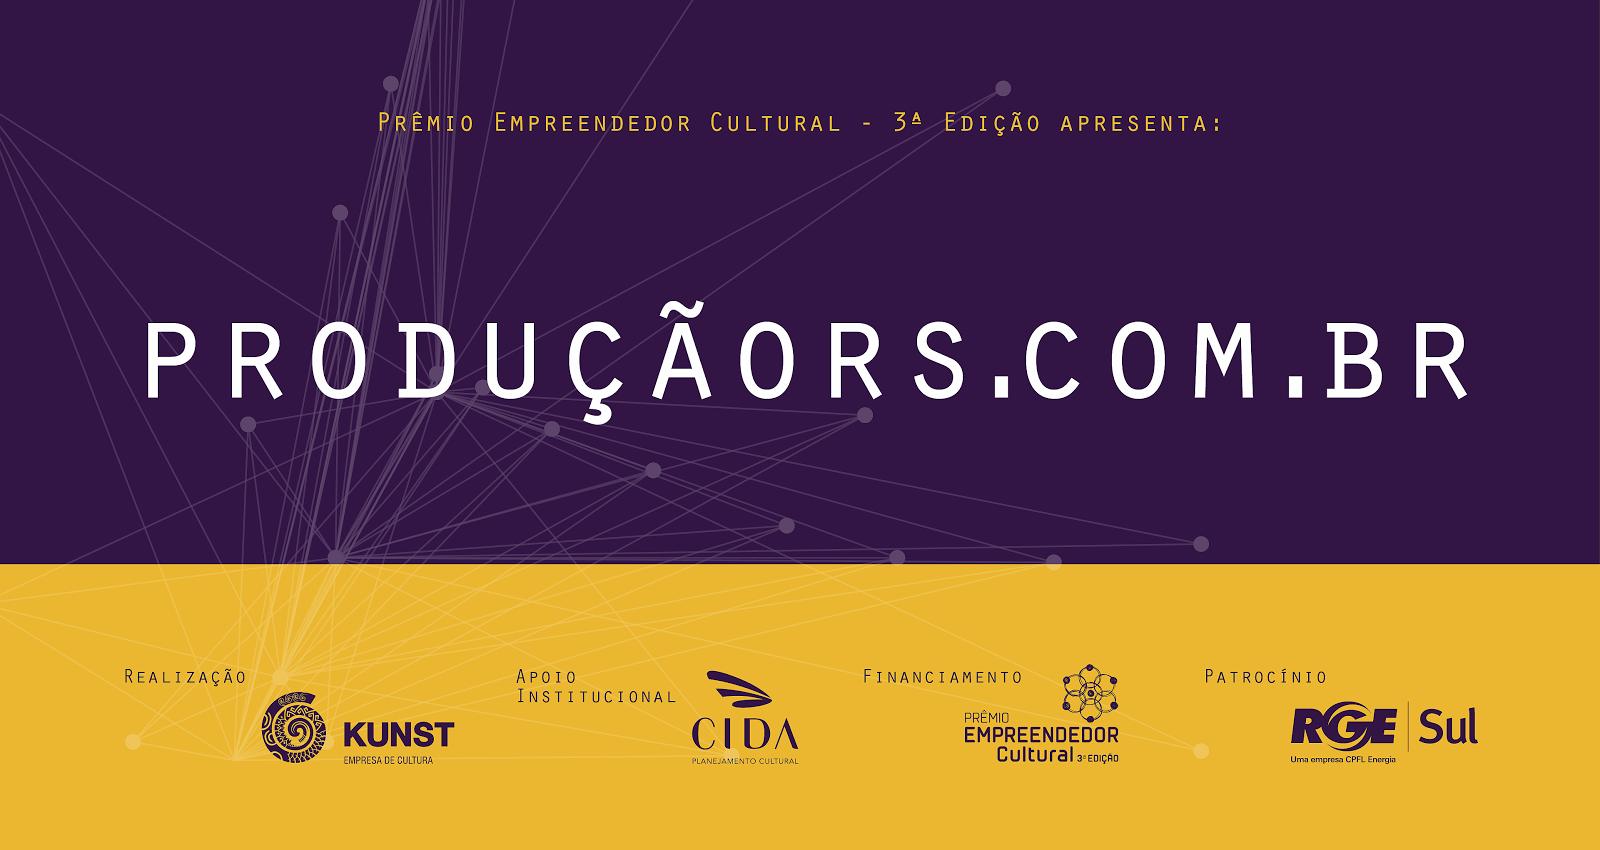 producaors.com.br